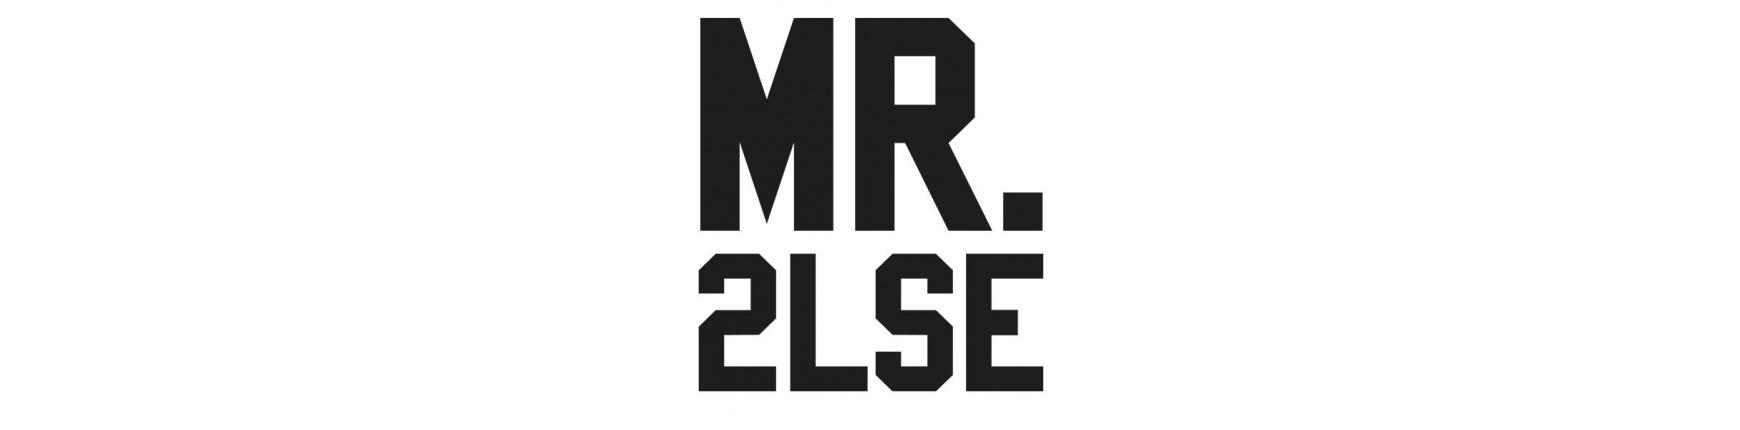 Mr2lse